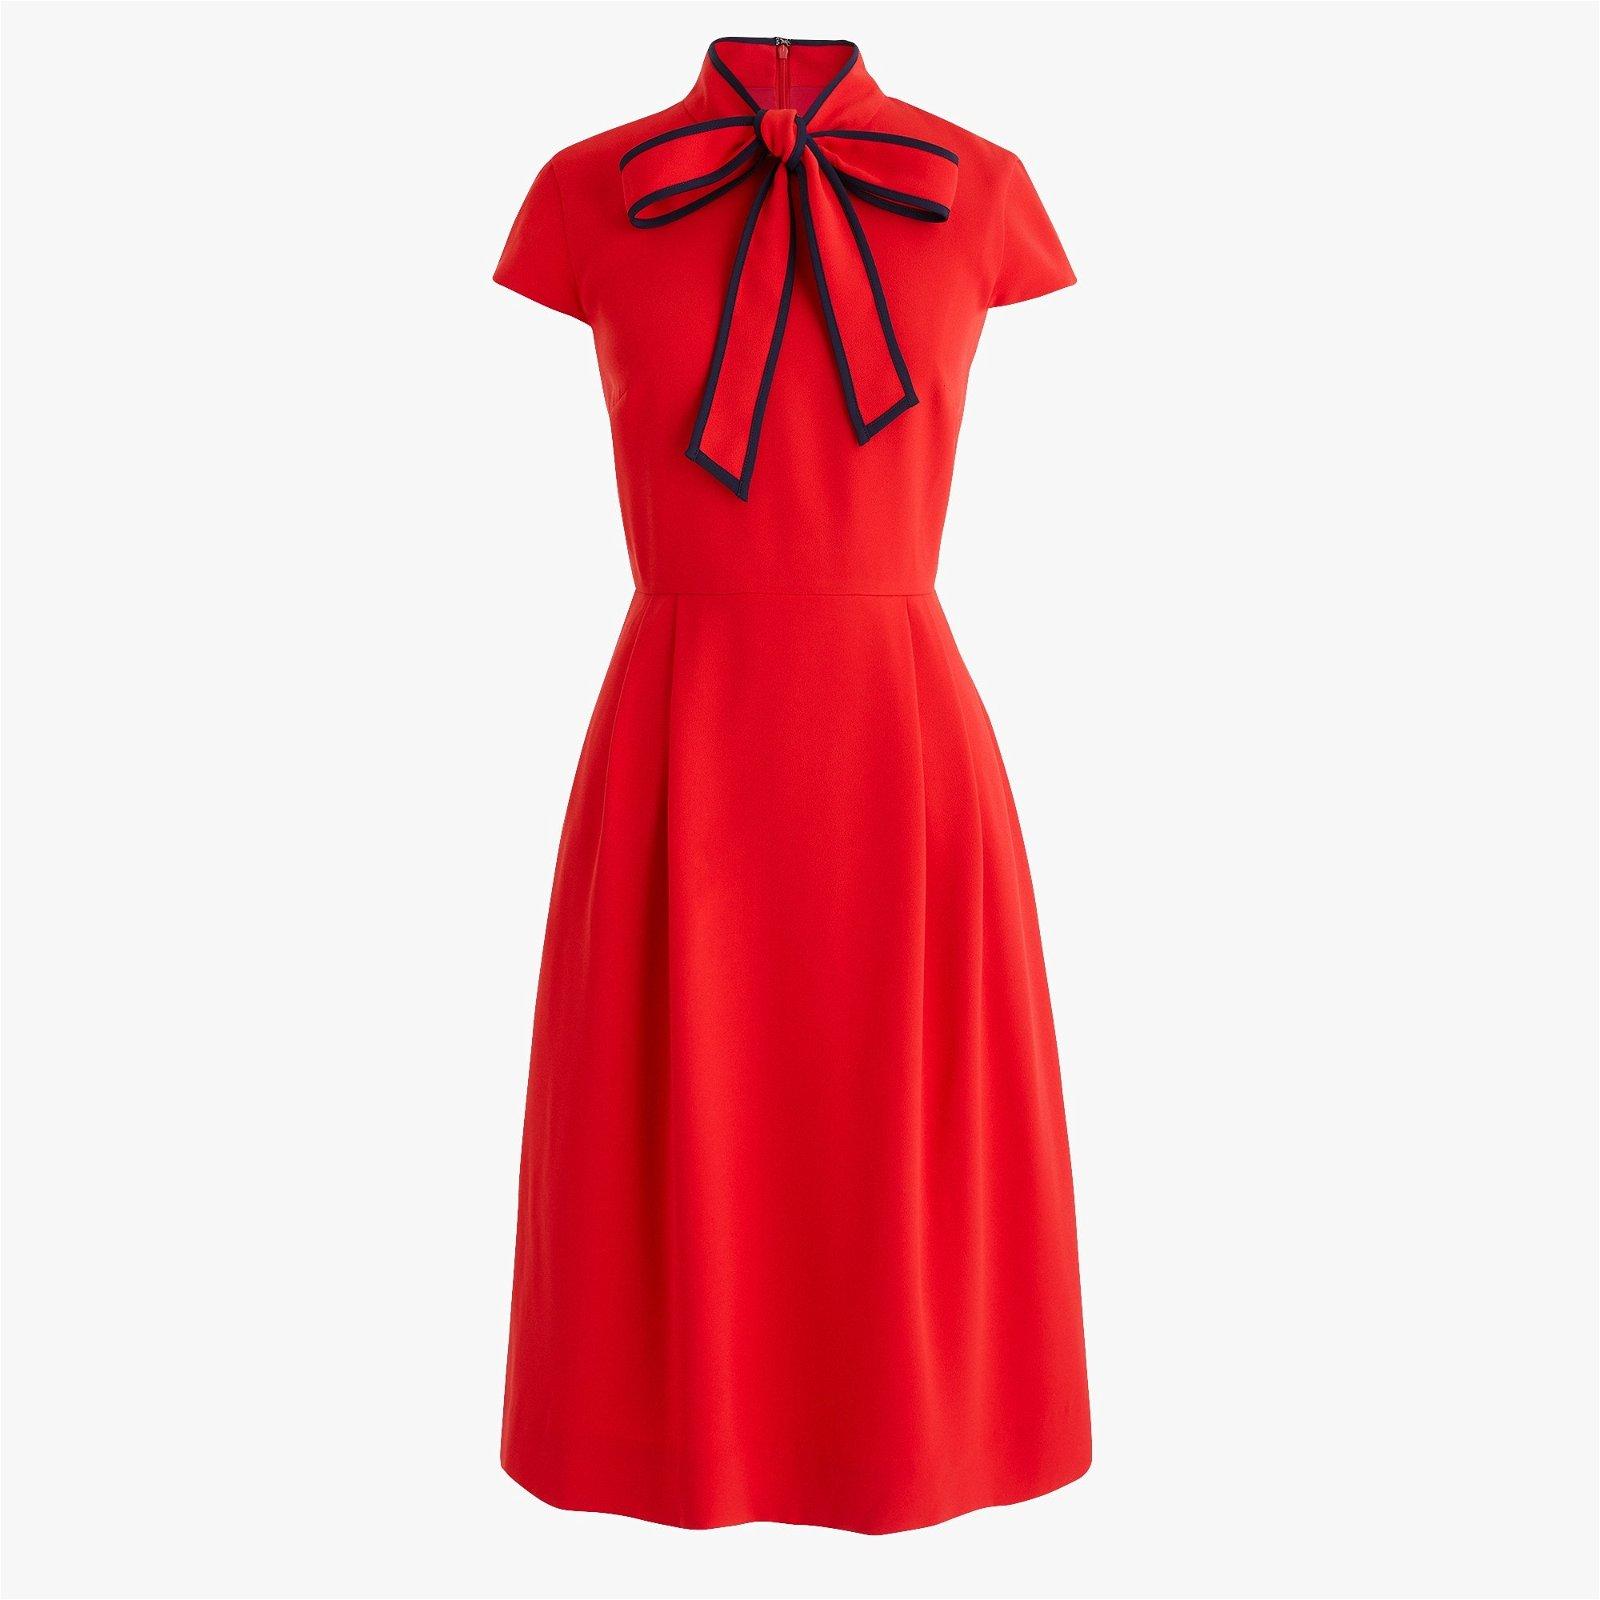 Classic Tie-neck dress in 365 crepe